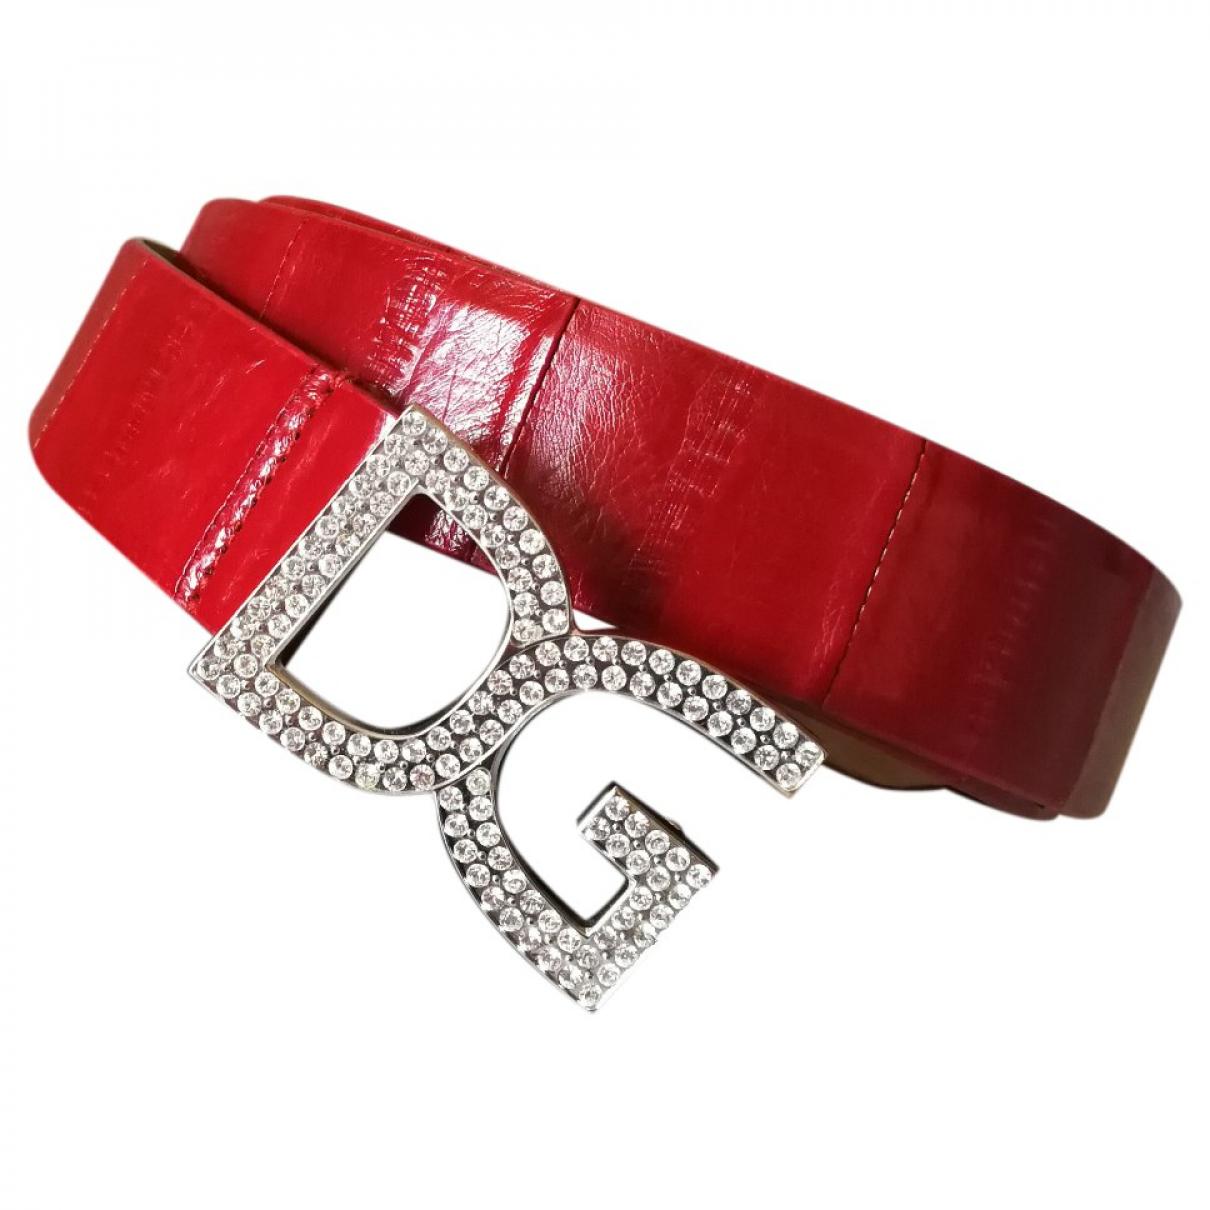 Dolce & Gabbana \N Red Leather belt for Women M International